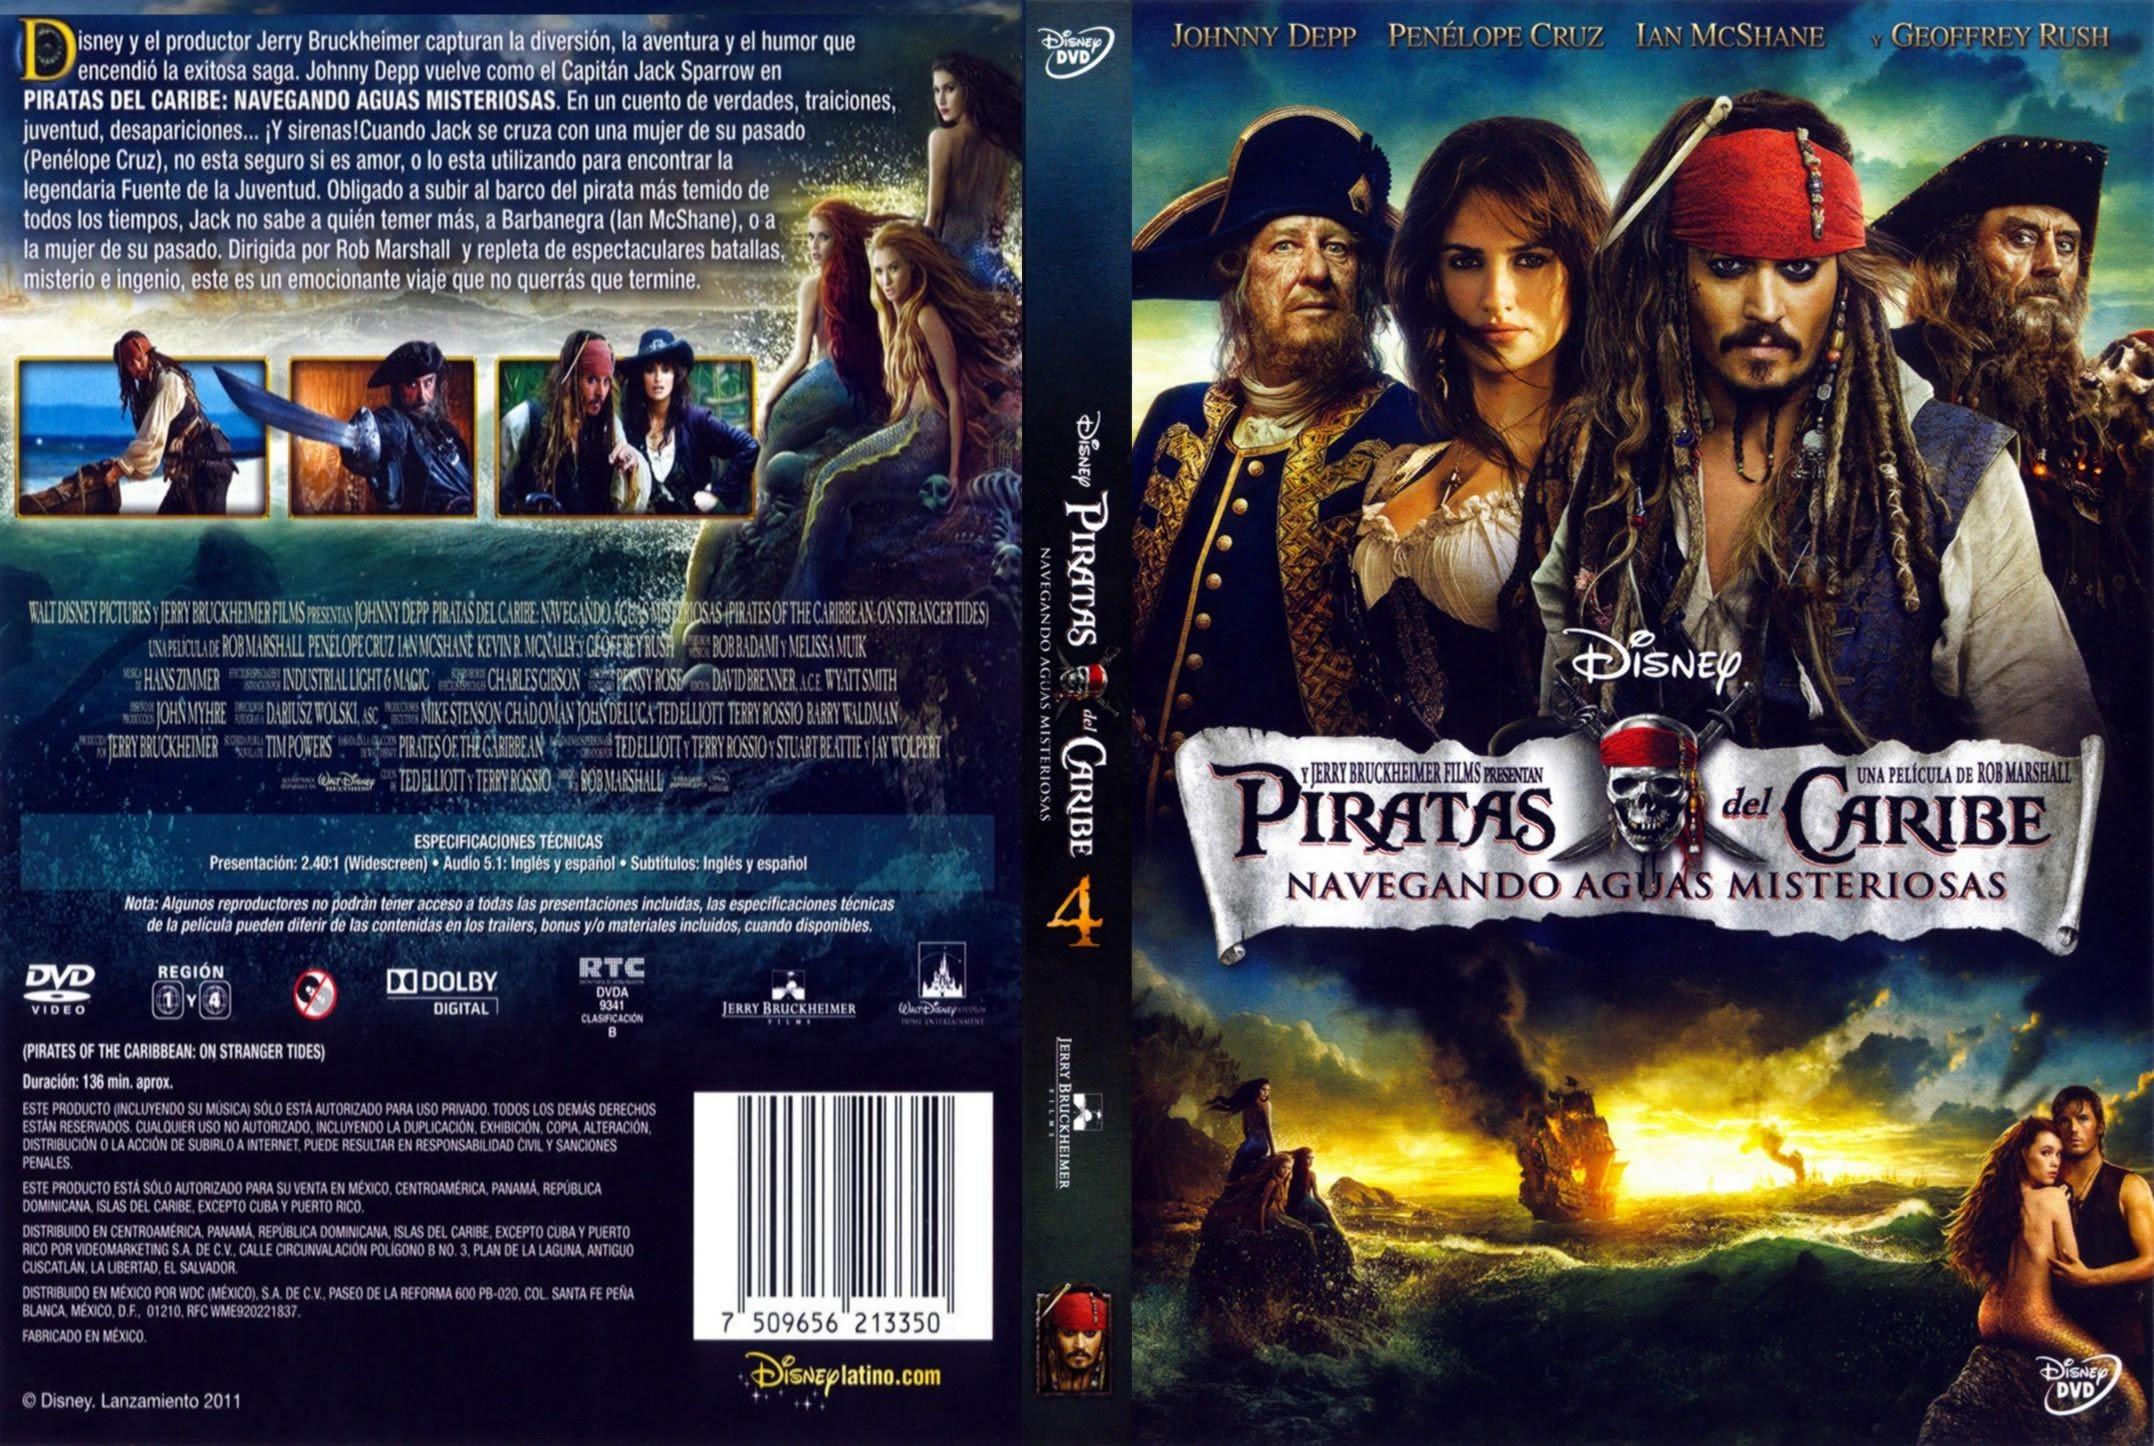 Cine Erotico Online: Piratas del Caribe XXX